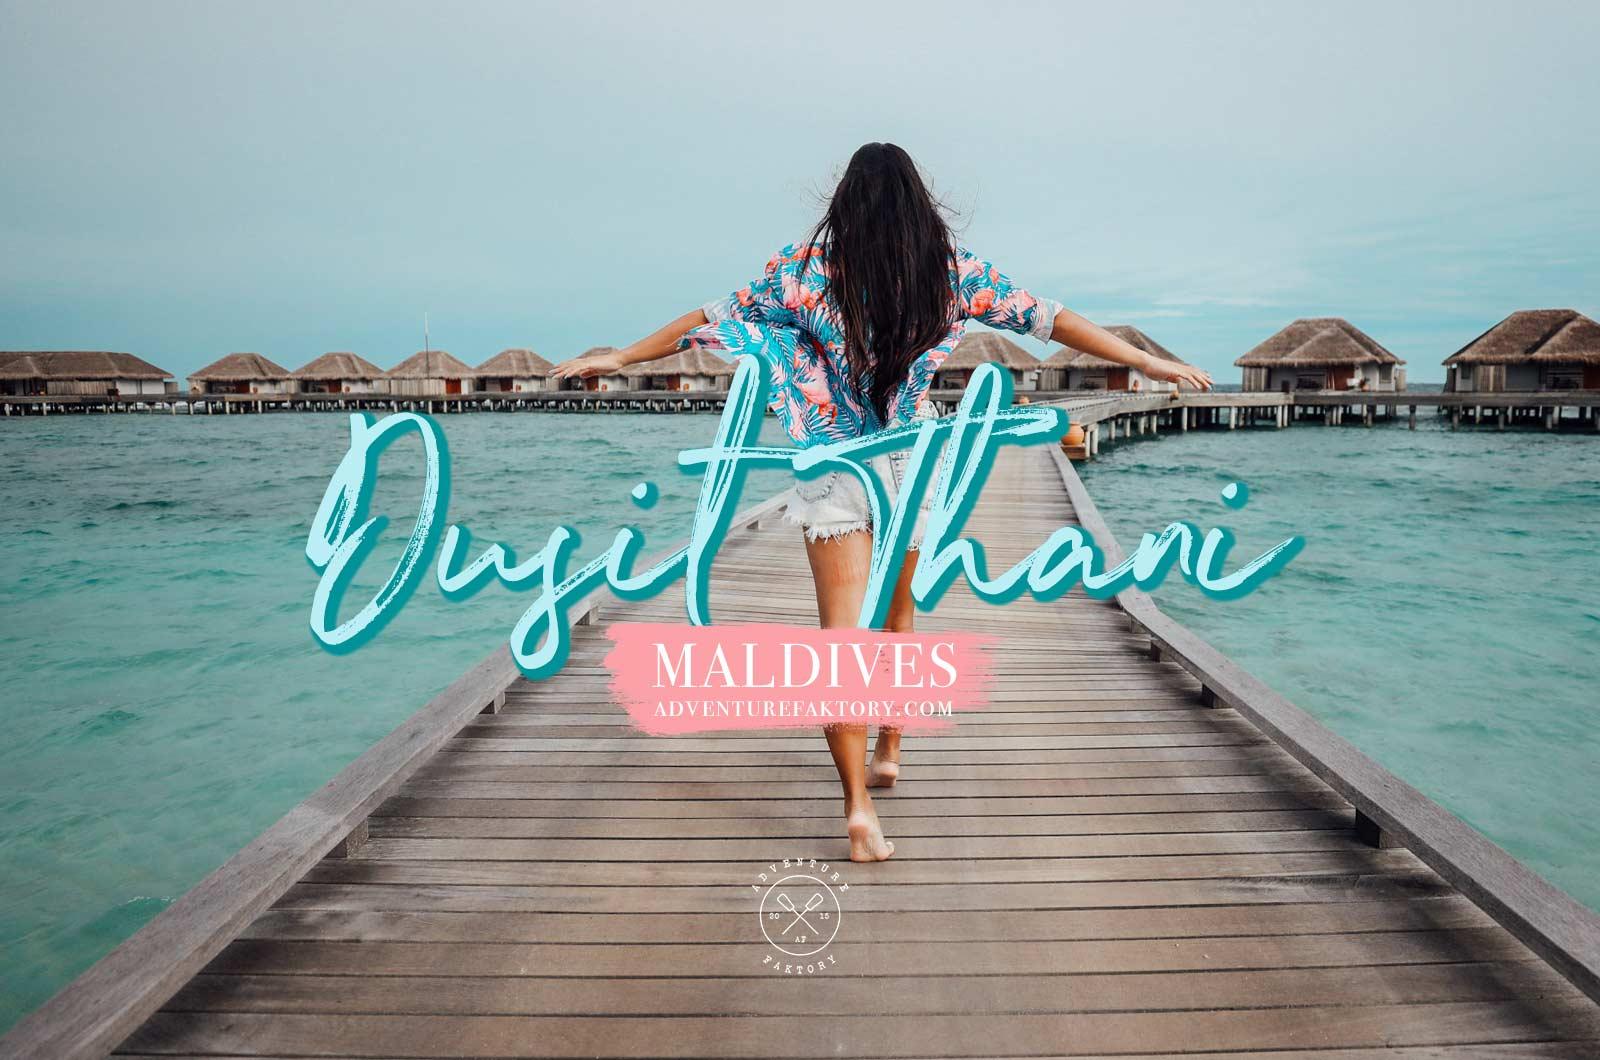 Check In Dusit Thani Maldives Adventurefaktory Middle